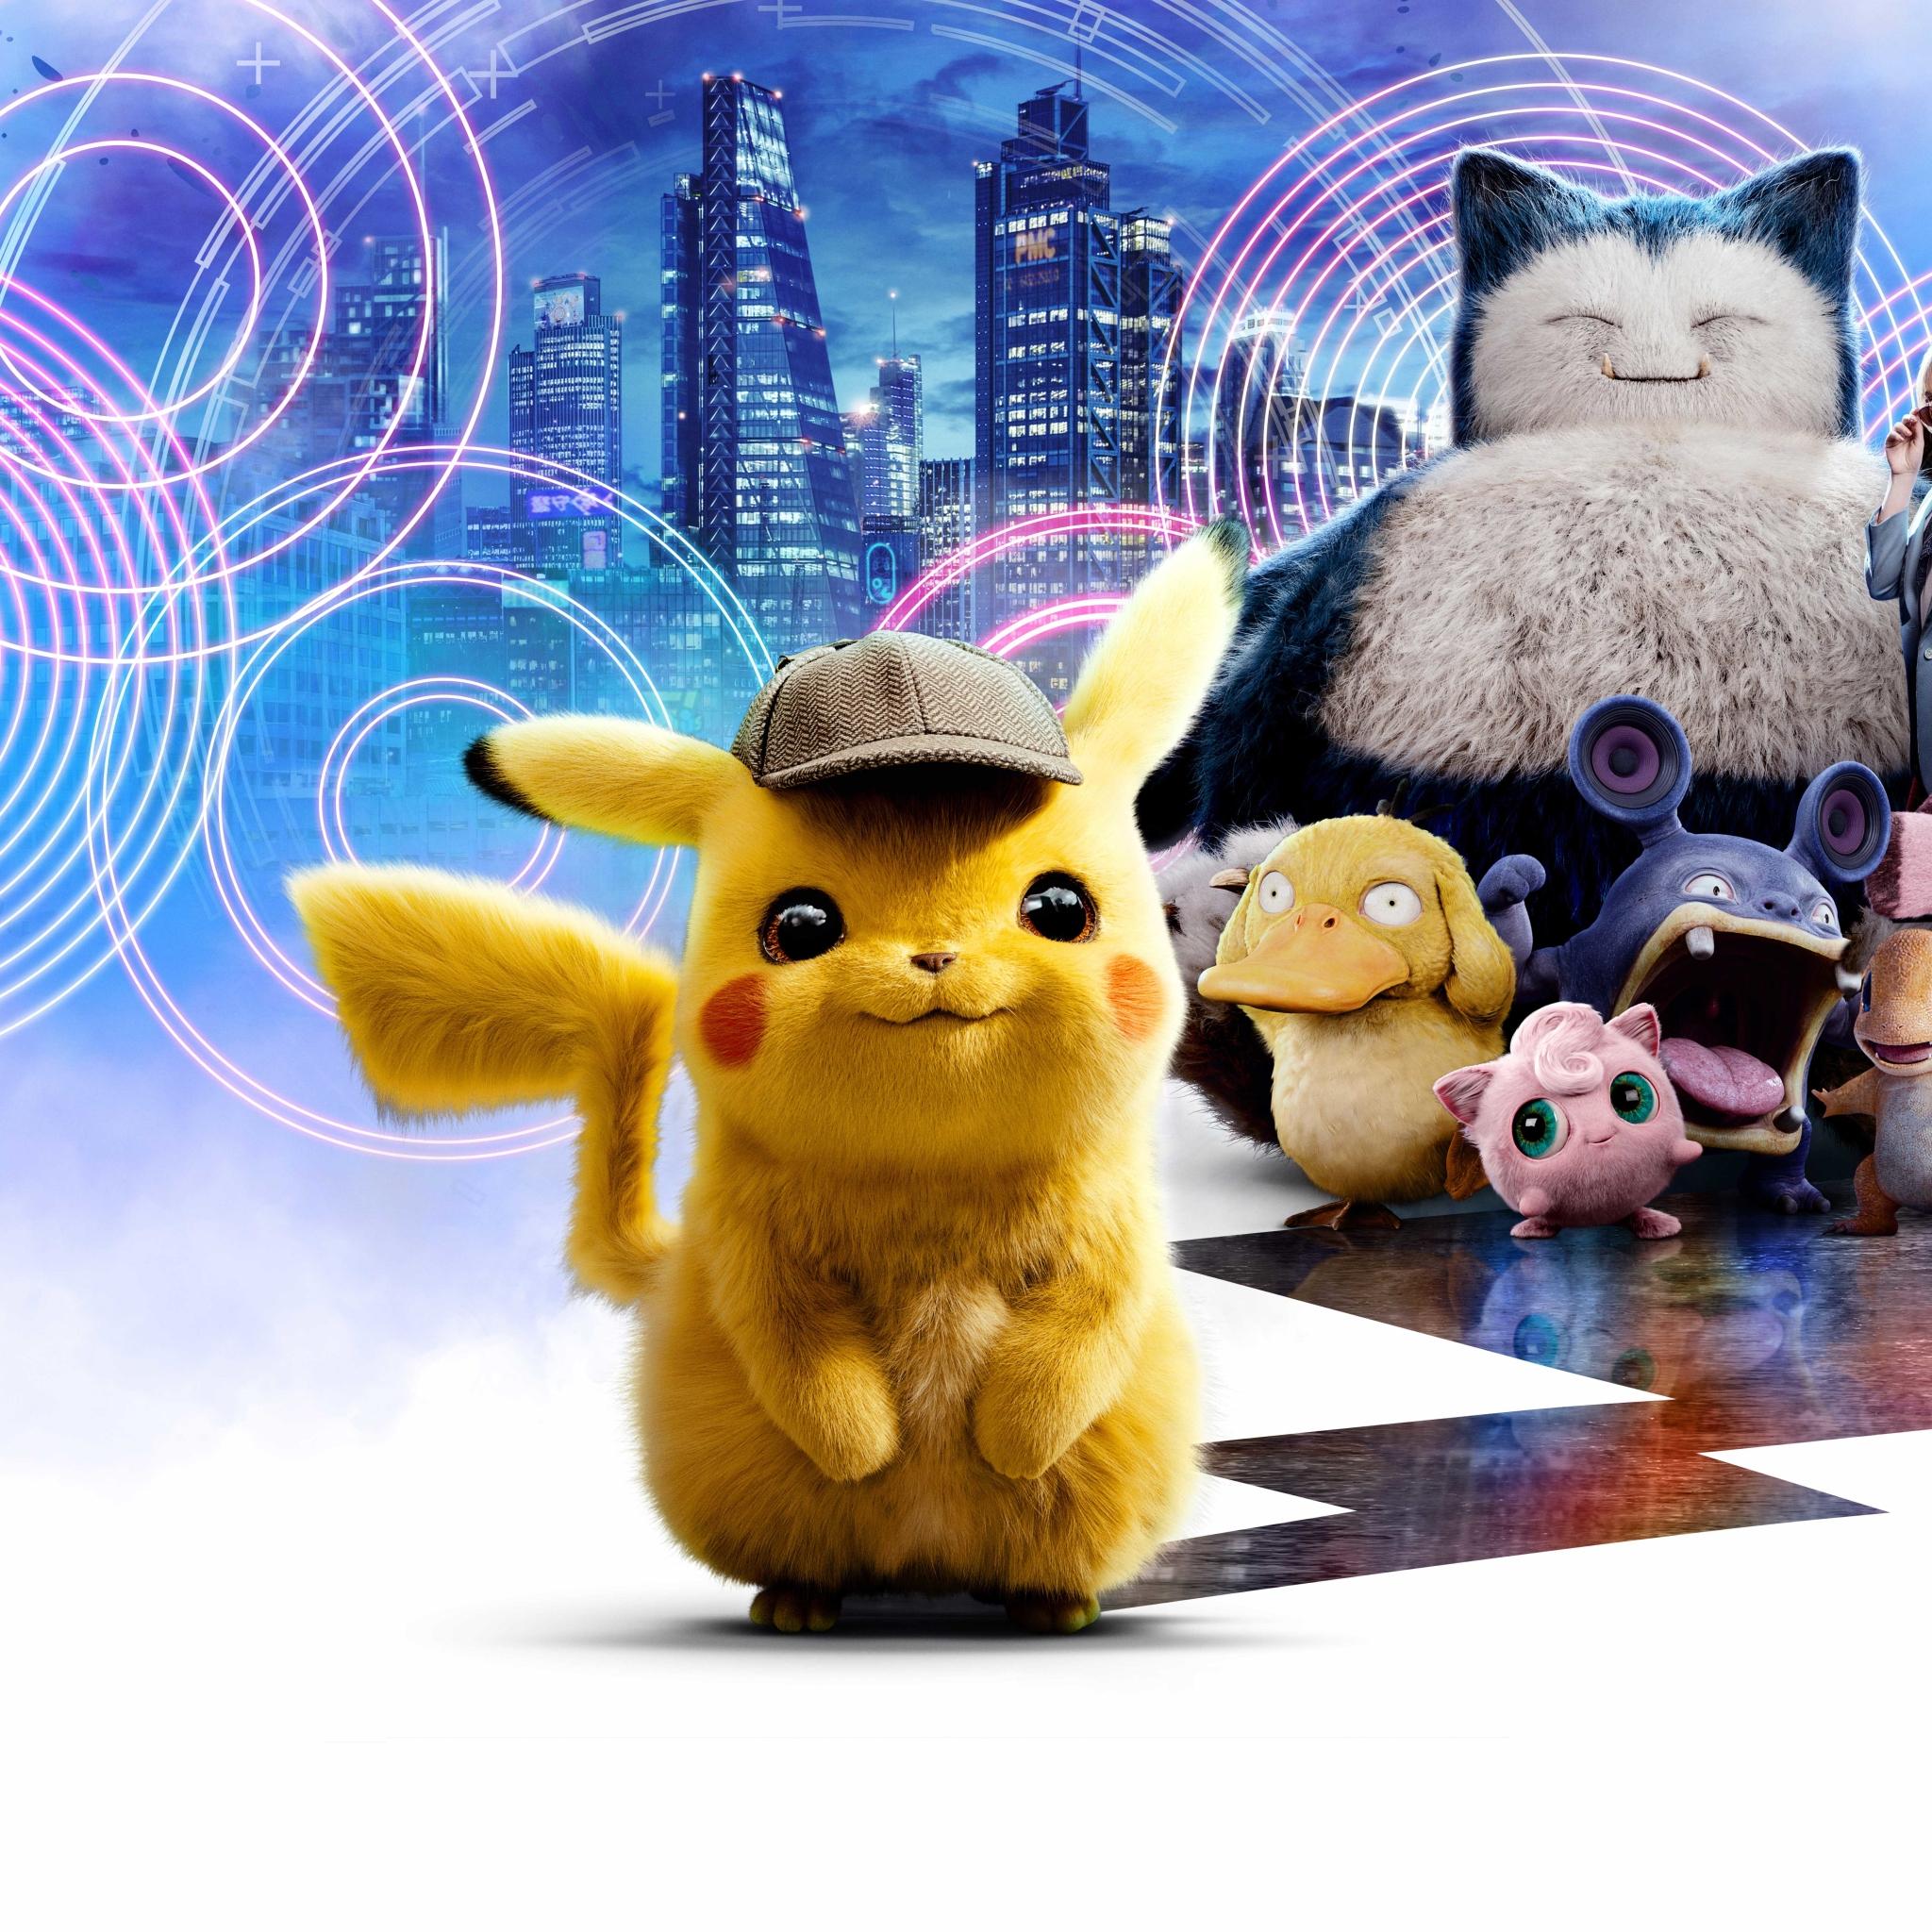 2048x2048 Poster Of Pokemon Detective Pikachu Ipad Air ...